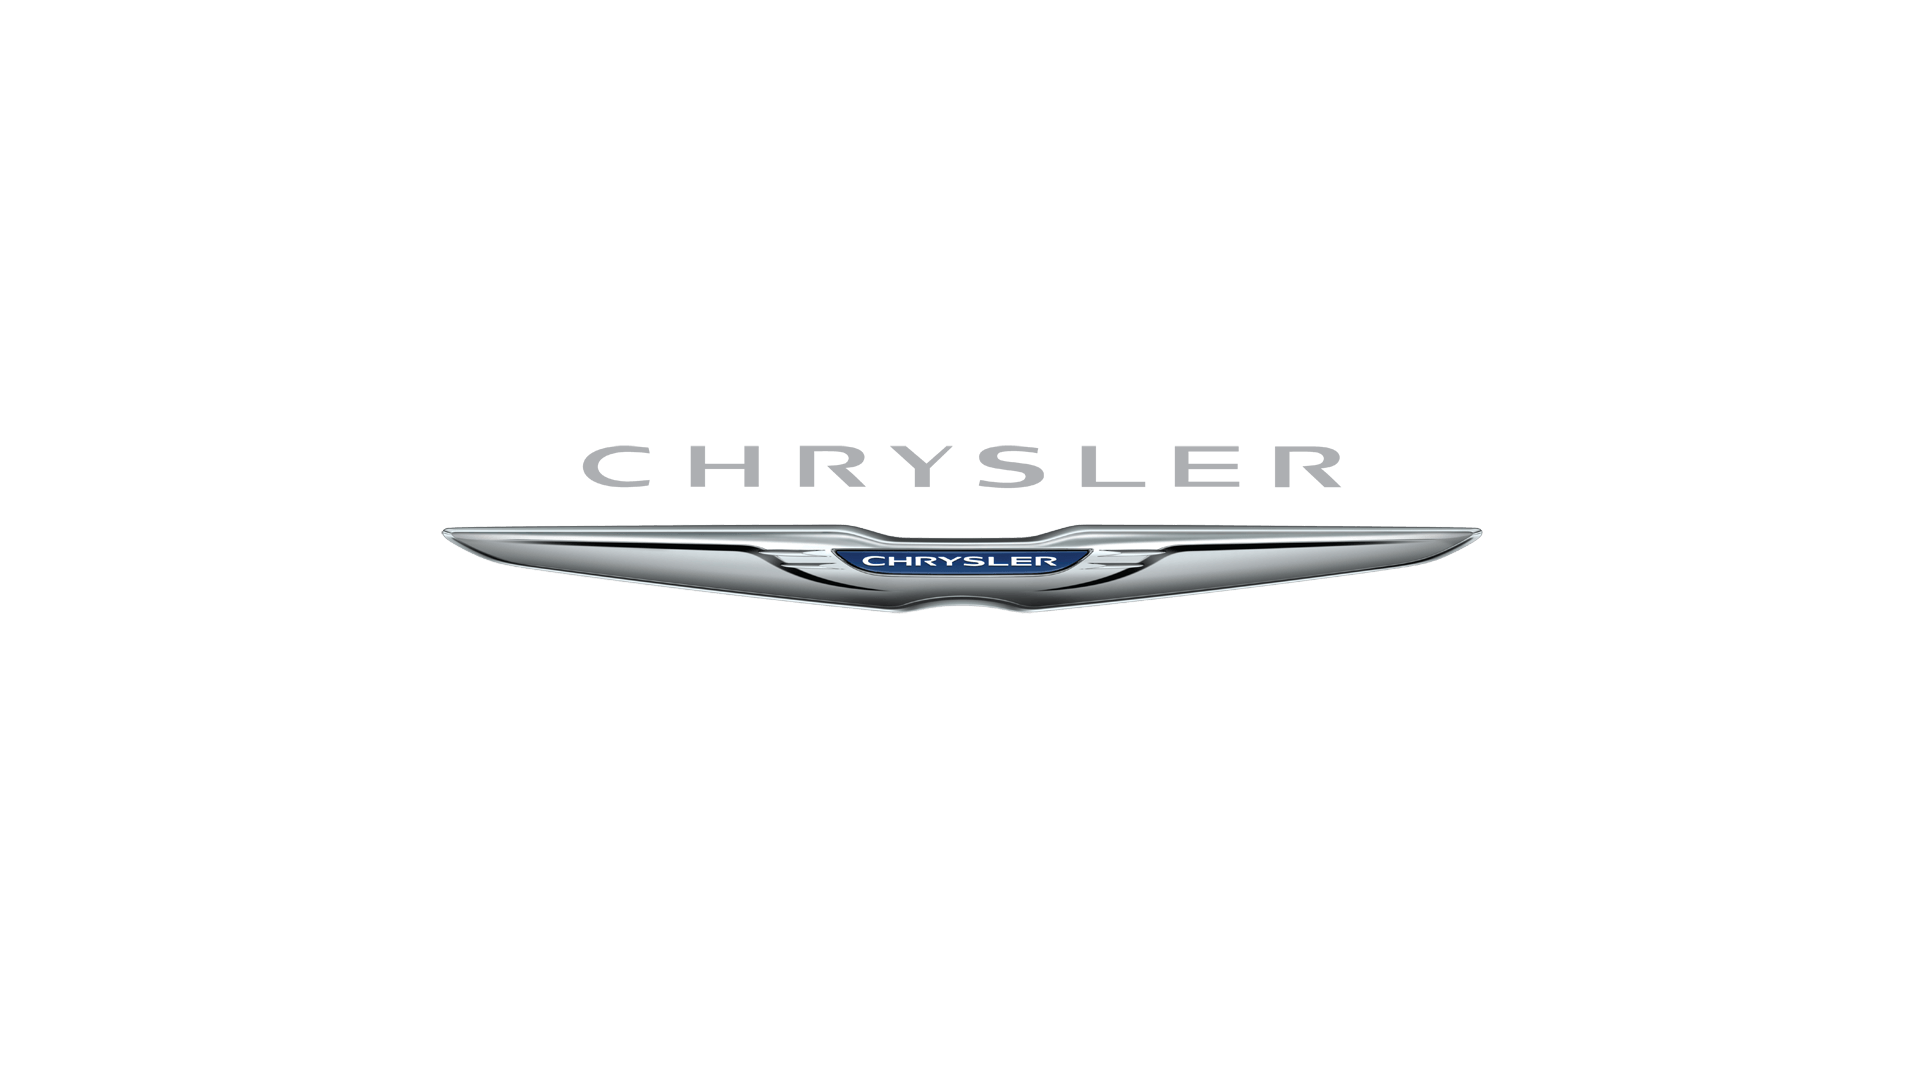 Car Logo Chrysler Transparent Png Stickpng